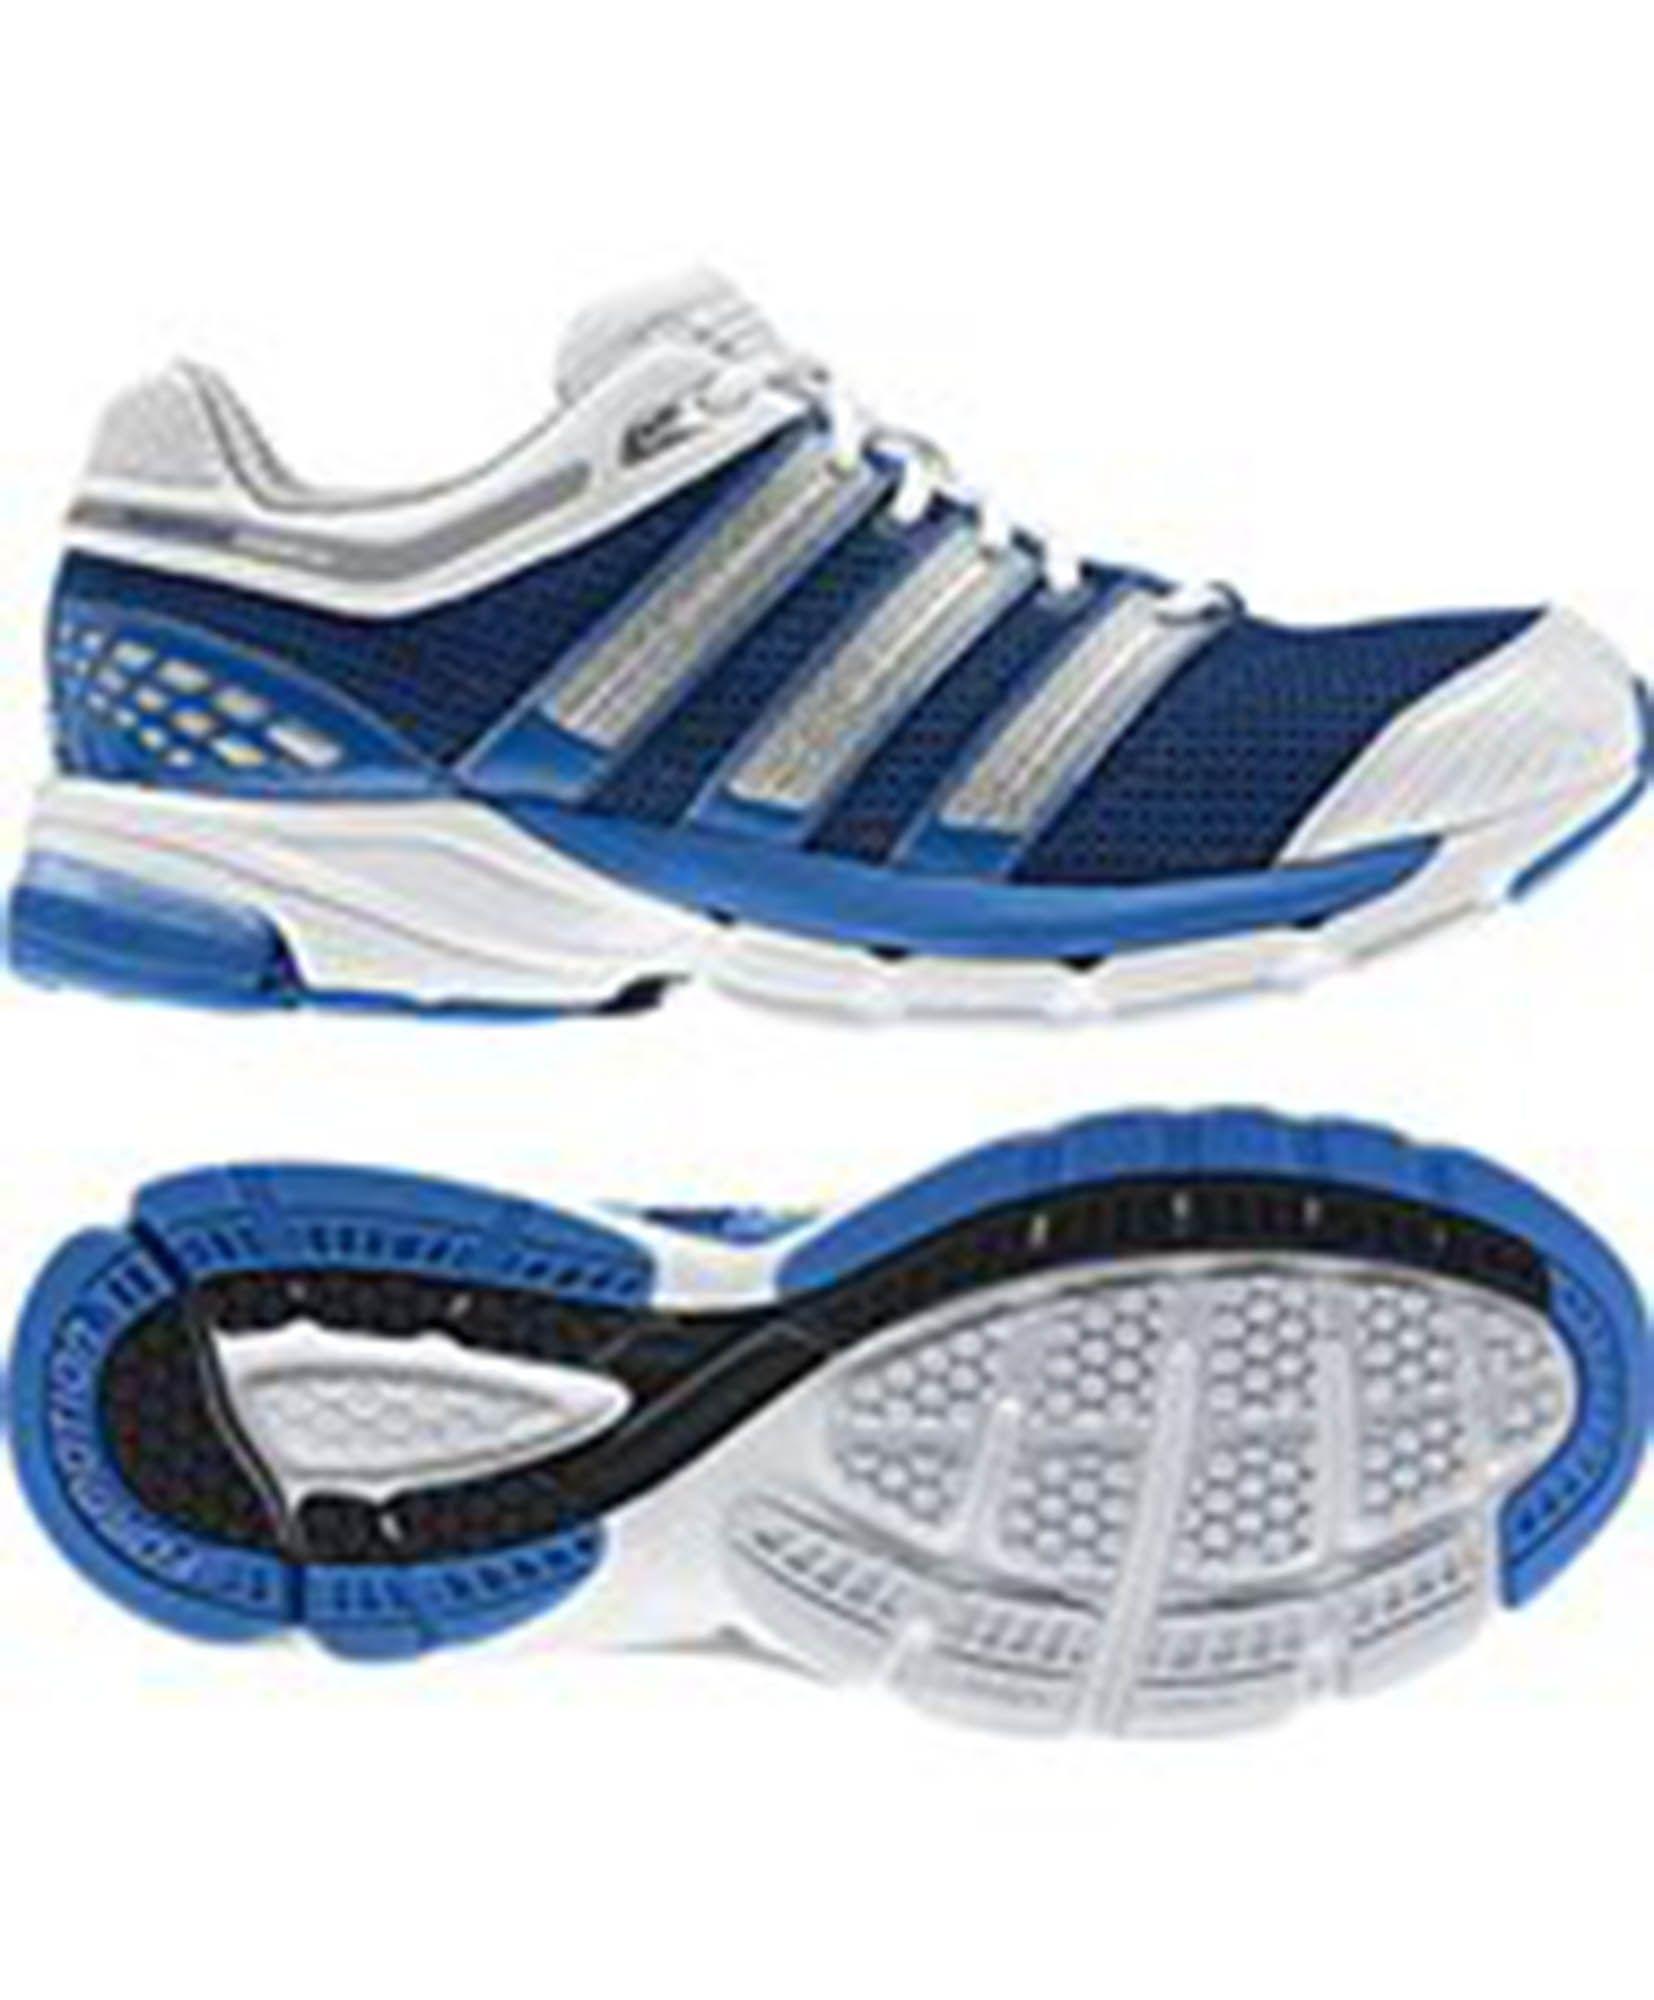 c5f0639b92cb6 Pistas De Atletismo ·  Zapatillas  adidas Resp Cushion 20M perfectas para   trail  running Calzado Deportivo